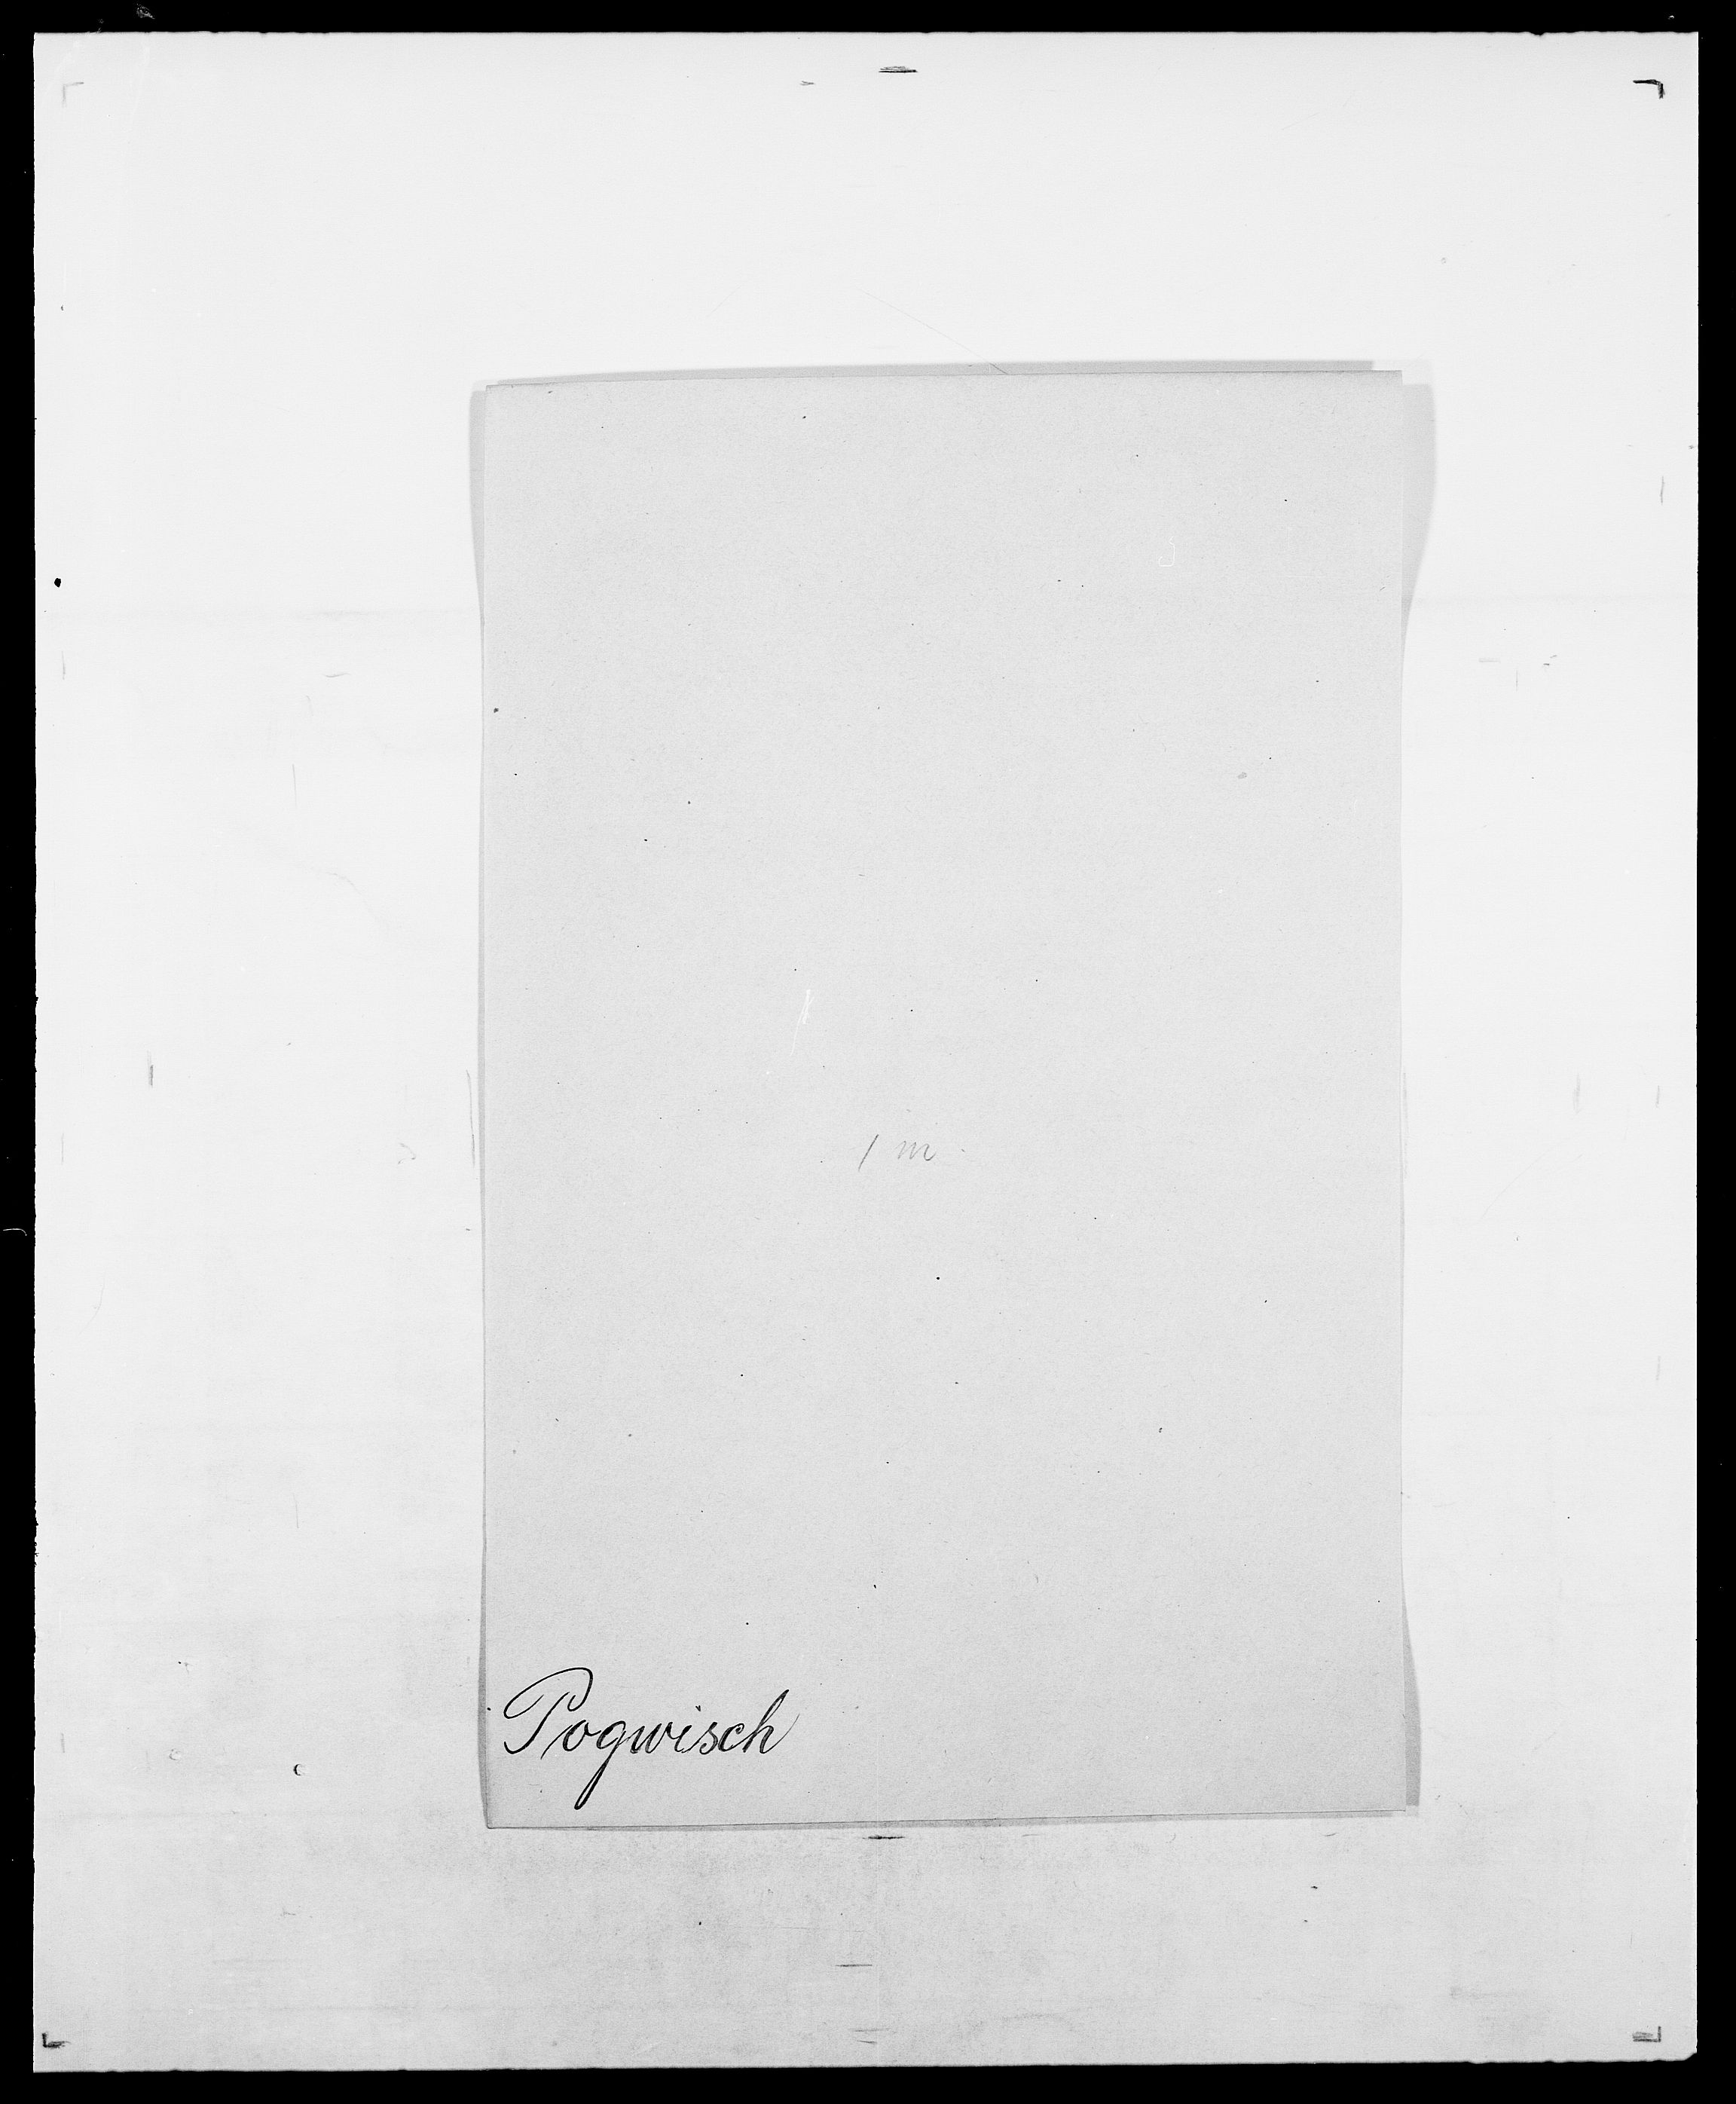 SAO, Delgobe, Charles Antoine - samling, D/Da/L0031: de Place - Raaum, s. 161